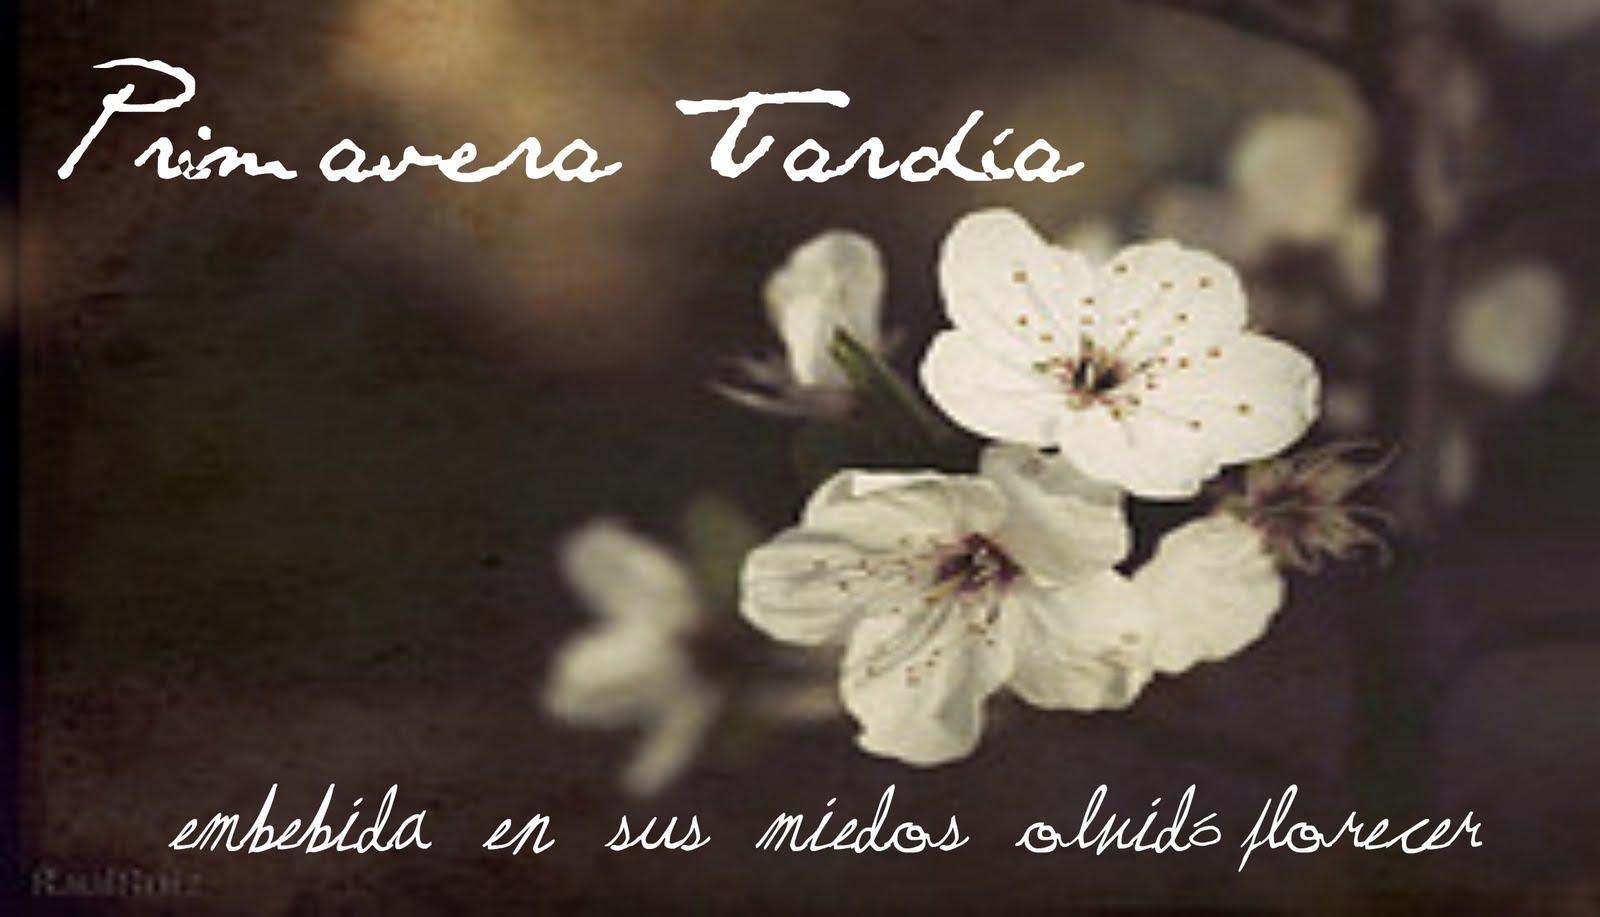 Primavera Tardía